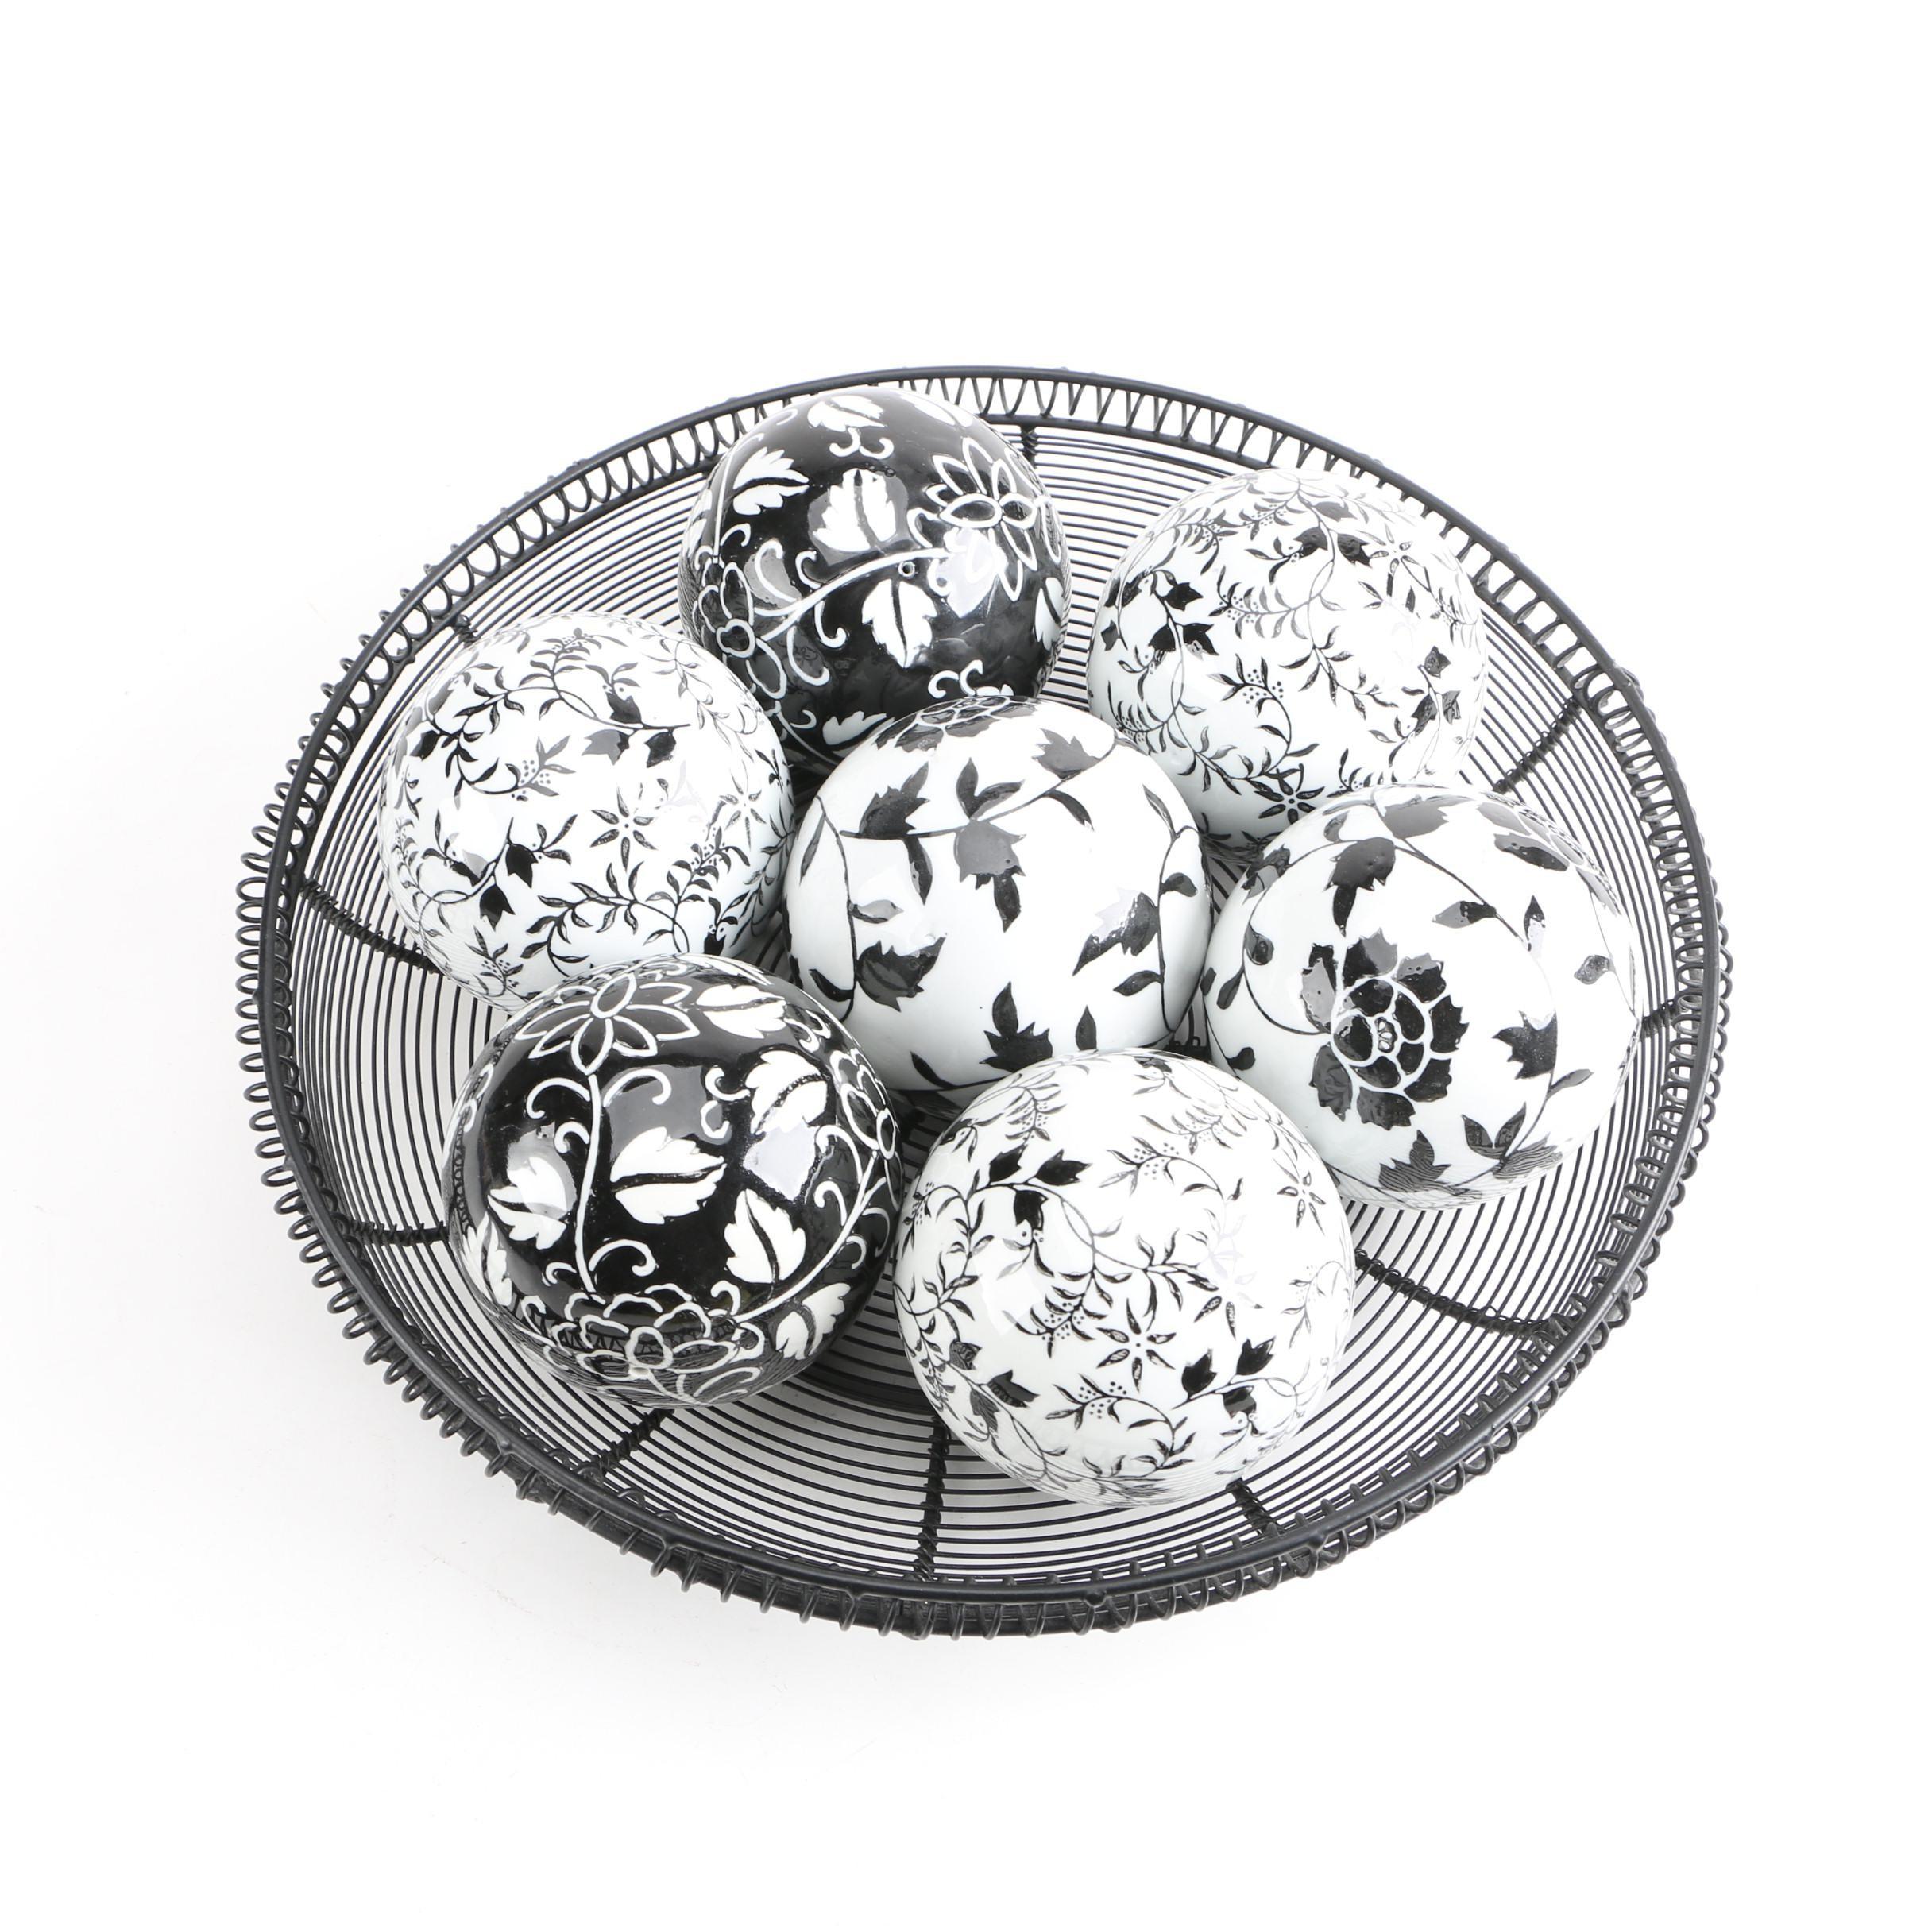 Black And White Decorative Ceramic Balls Endearing Black And White Decorative Ceramic Carpet Balls And Wire Basket  Ebth Design Decoration